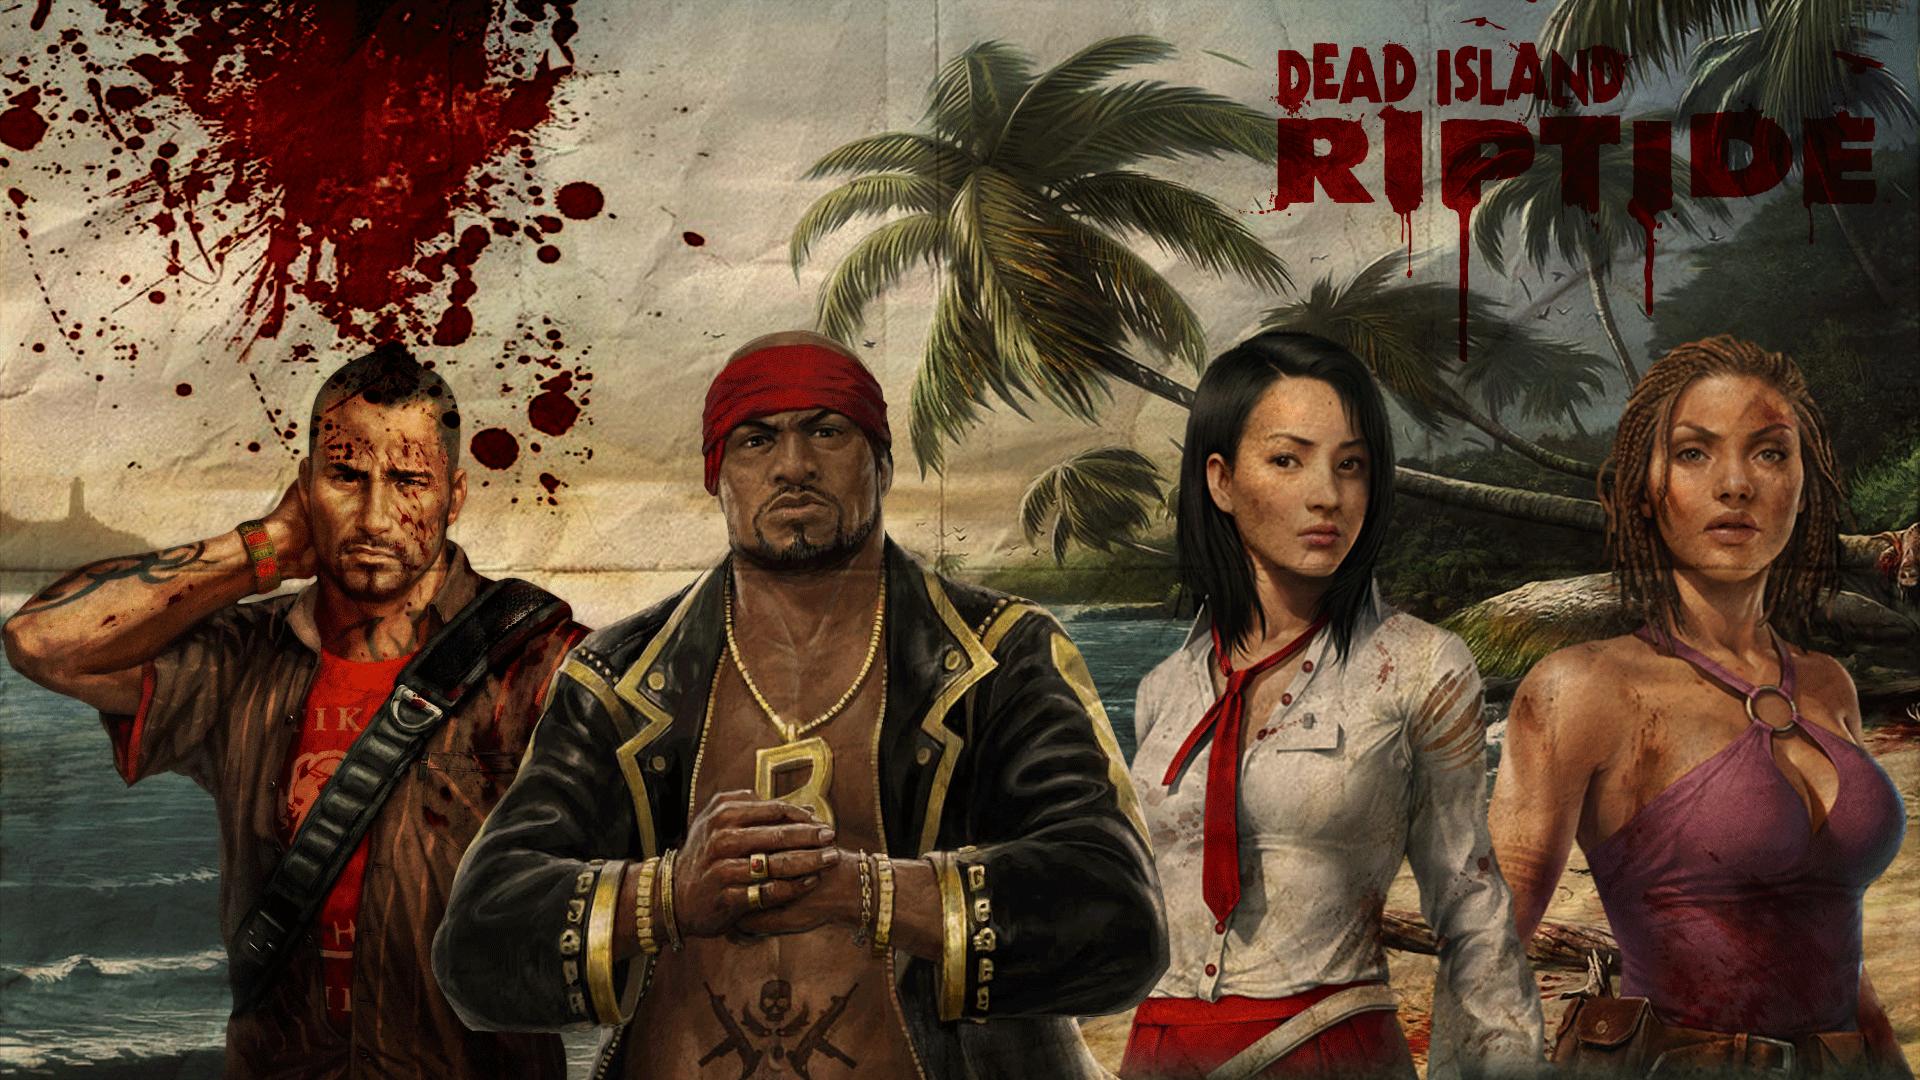 Dead Island Wallpaper For Desktop Wallpaper | WallpaperLepi